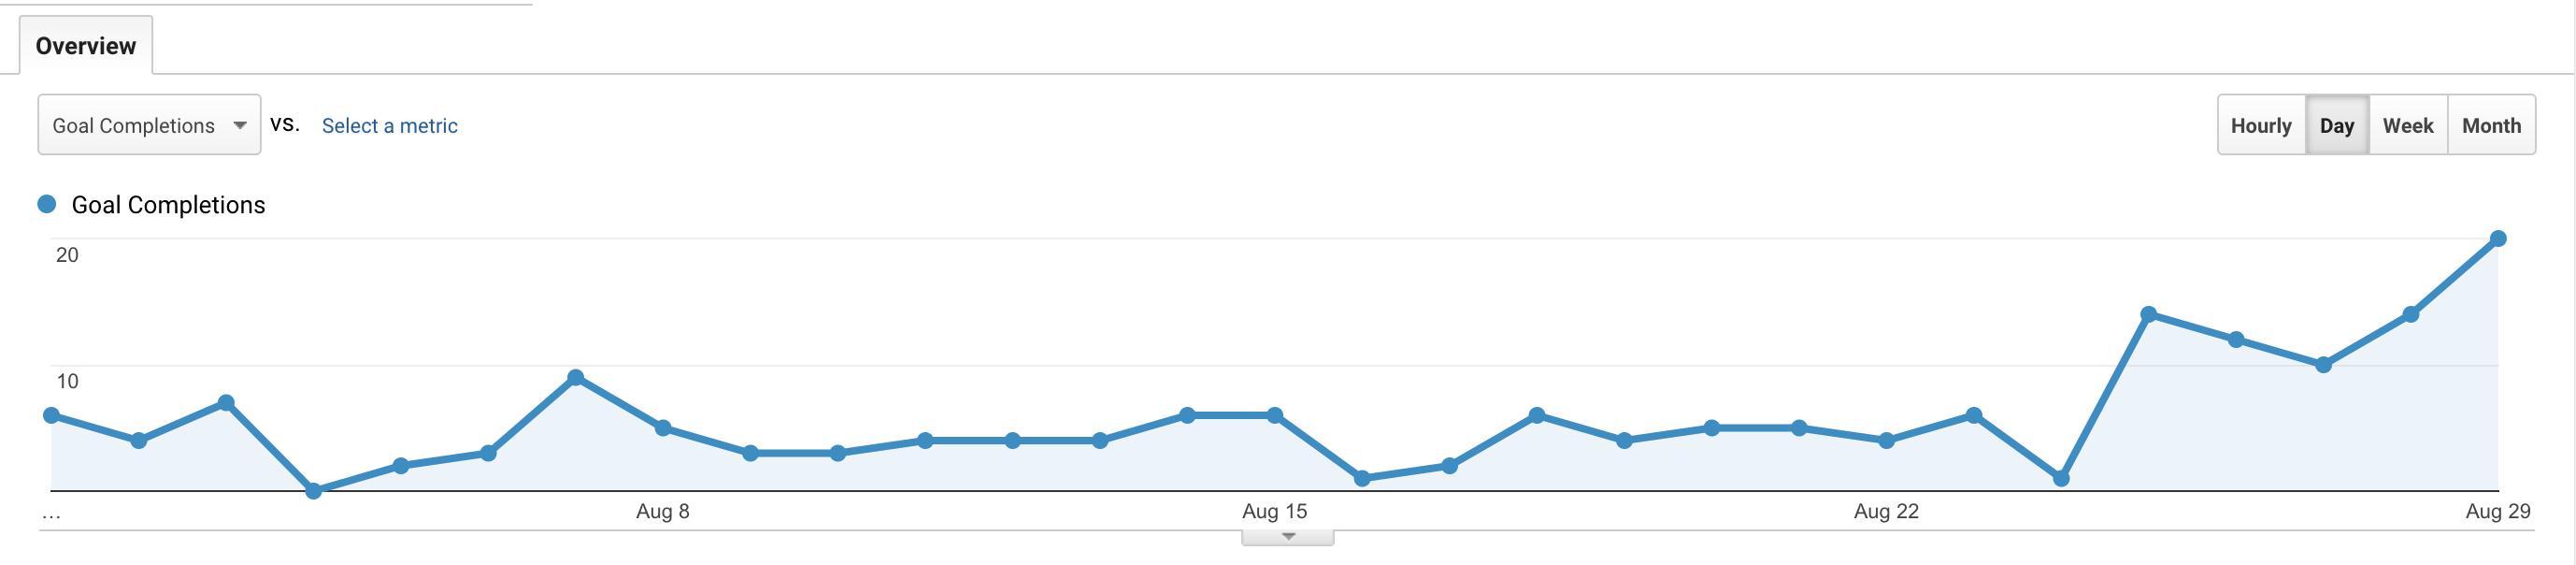 screen shot of real Fishpool Marketing lead generation data